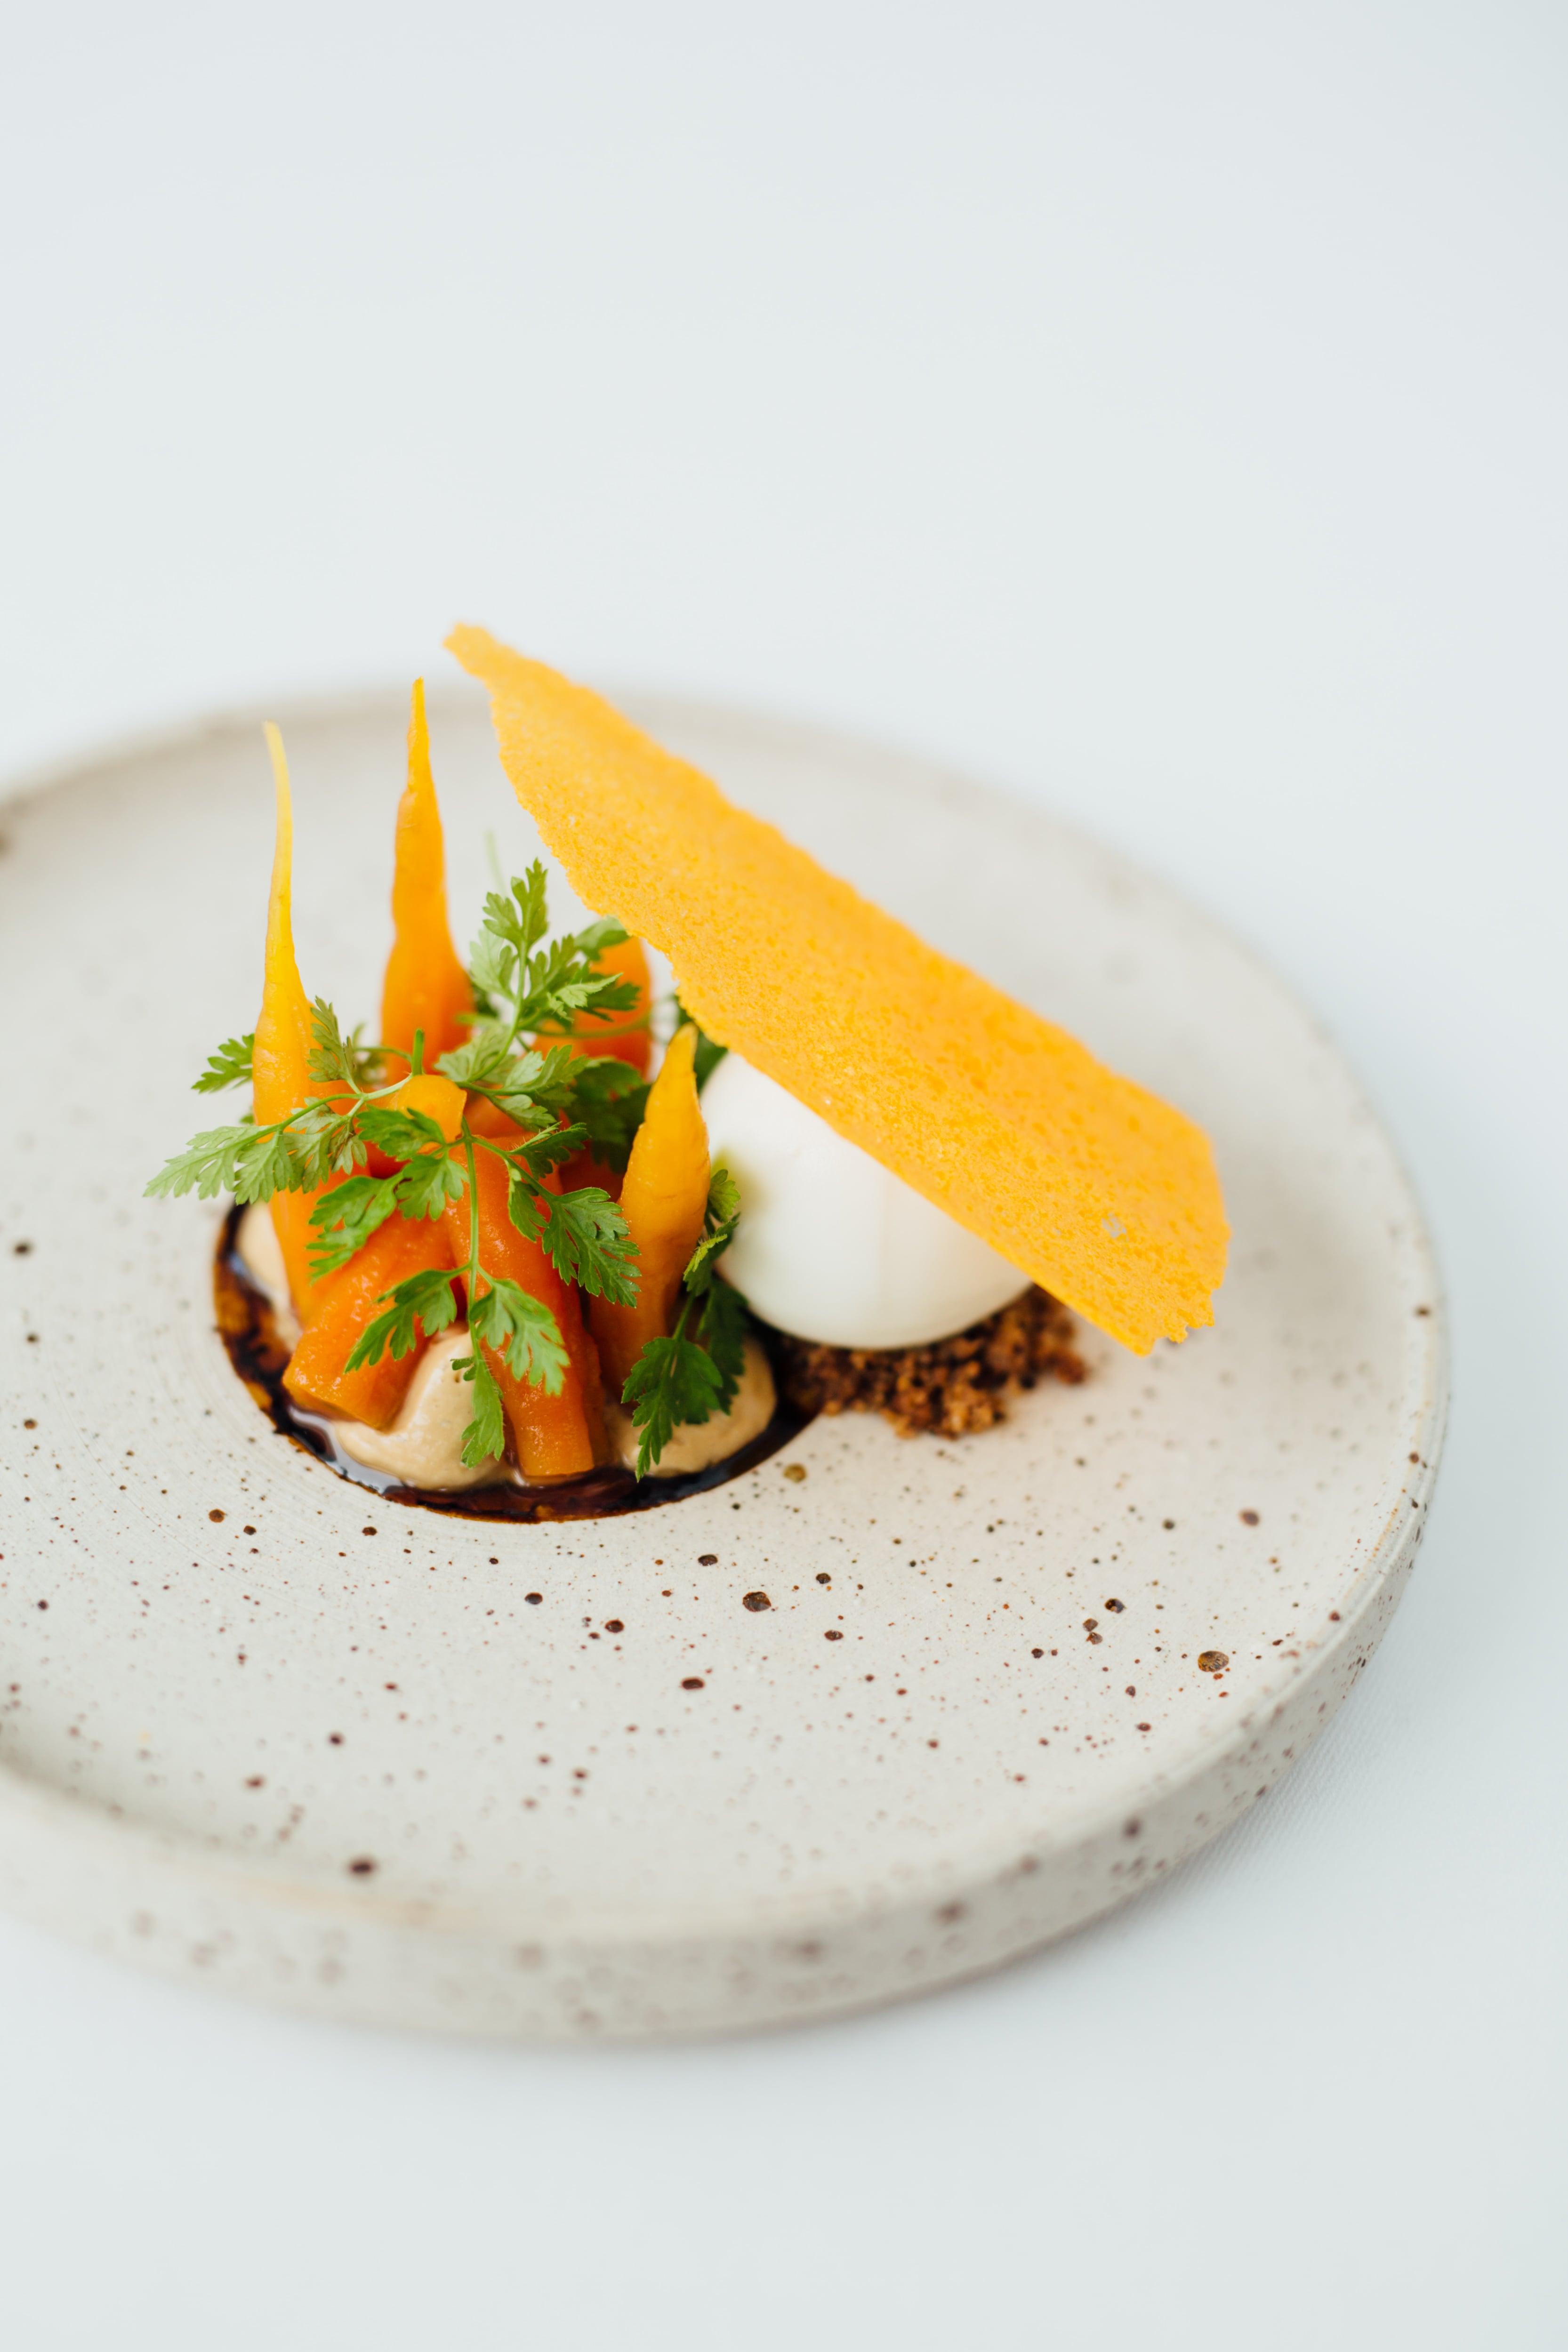 Michelin restaurant food